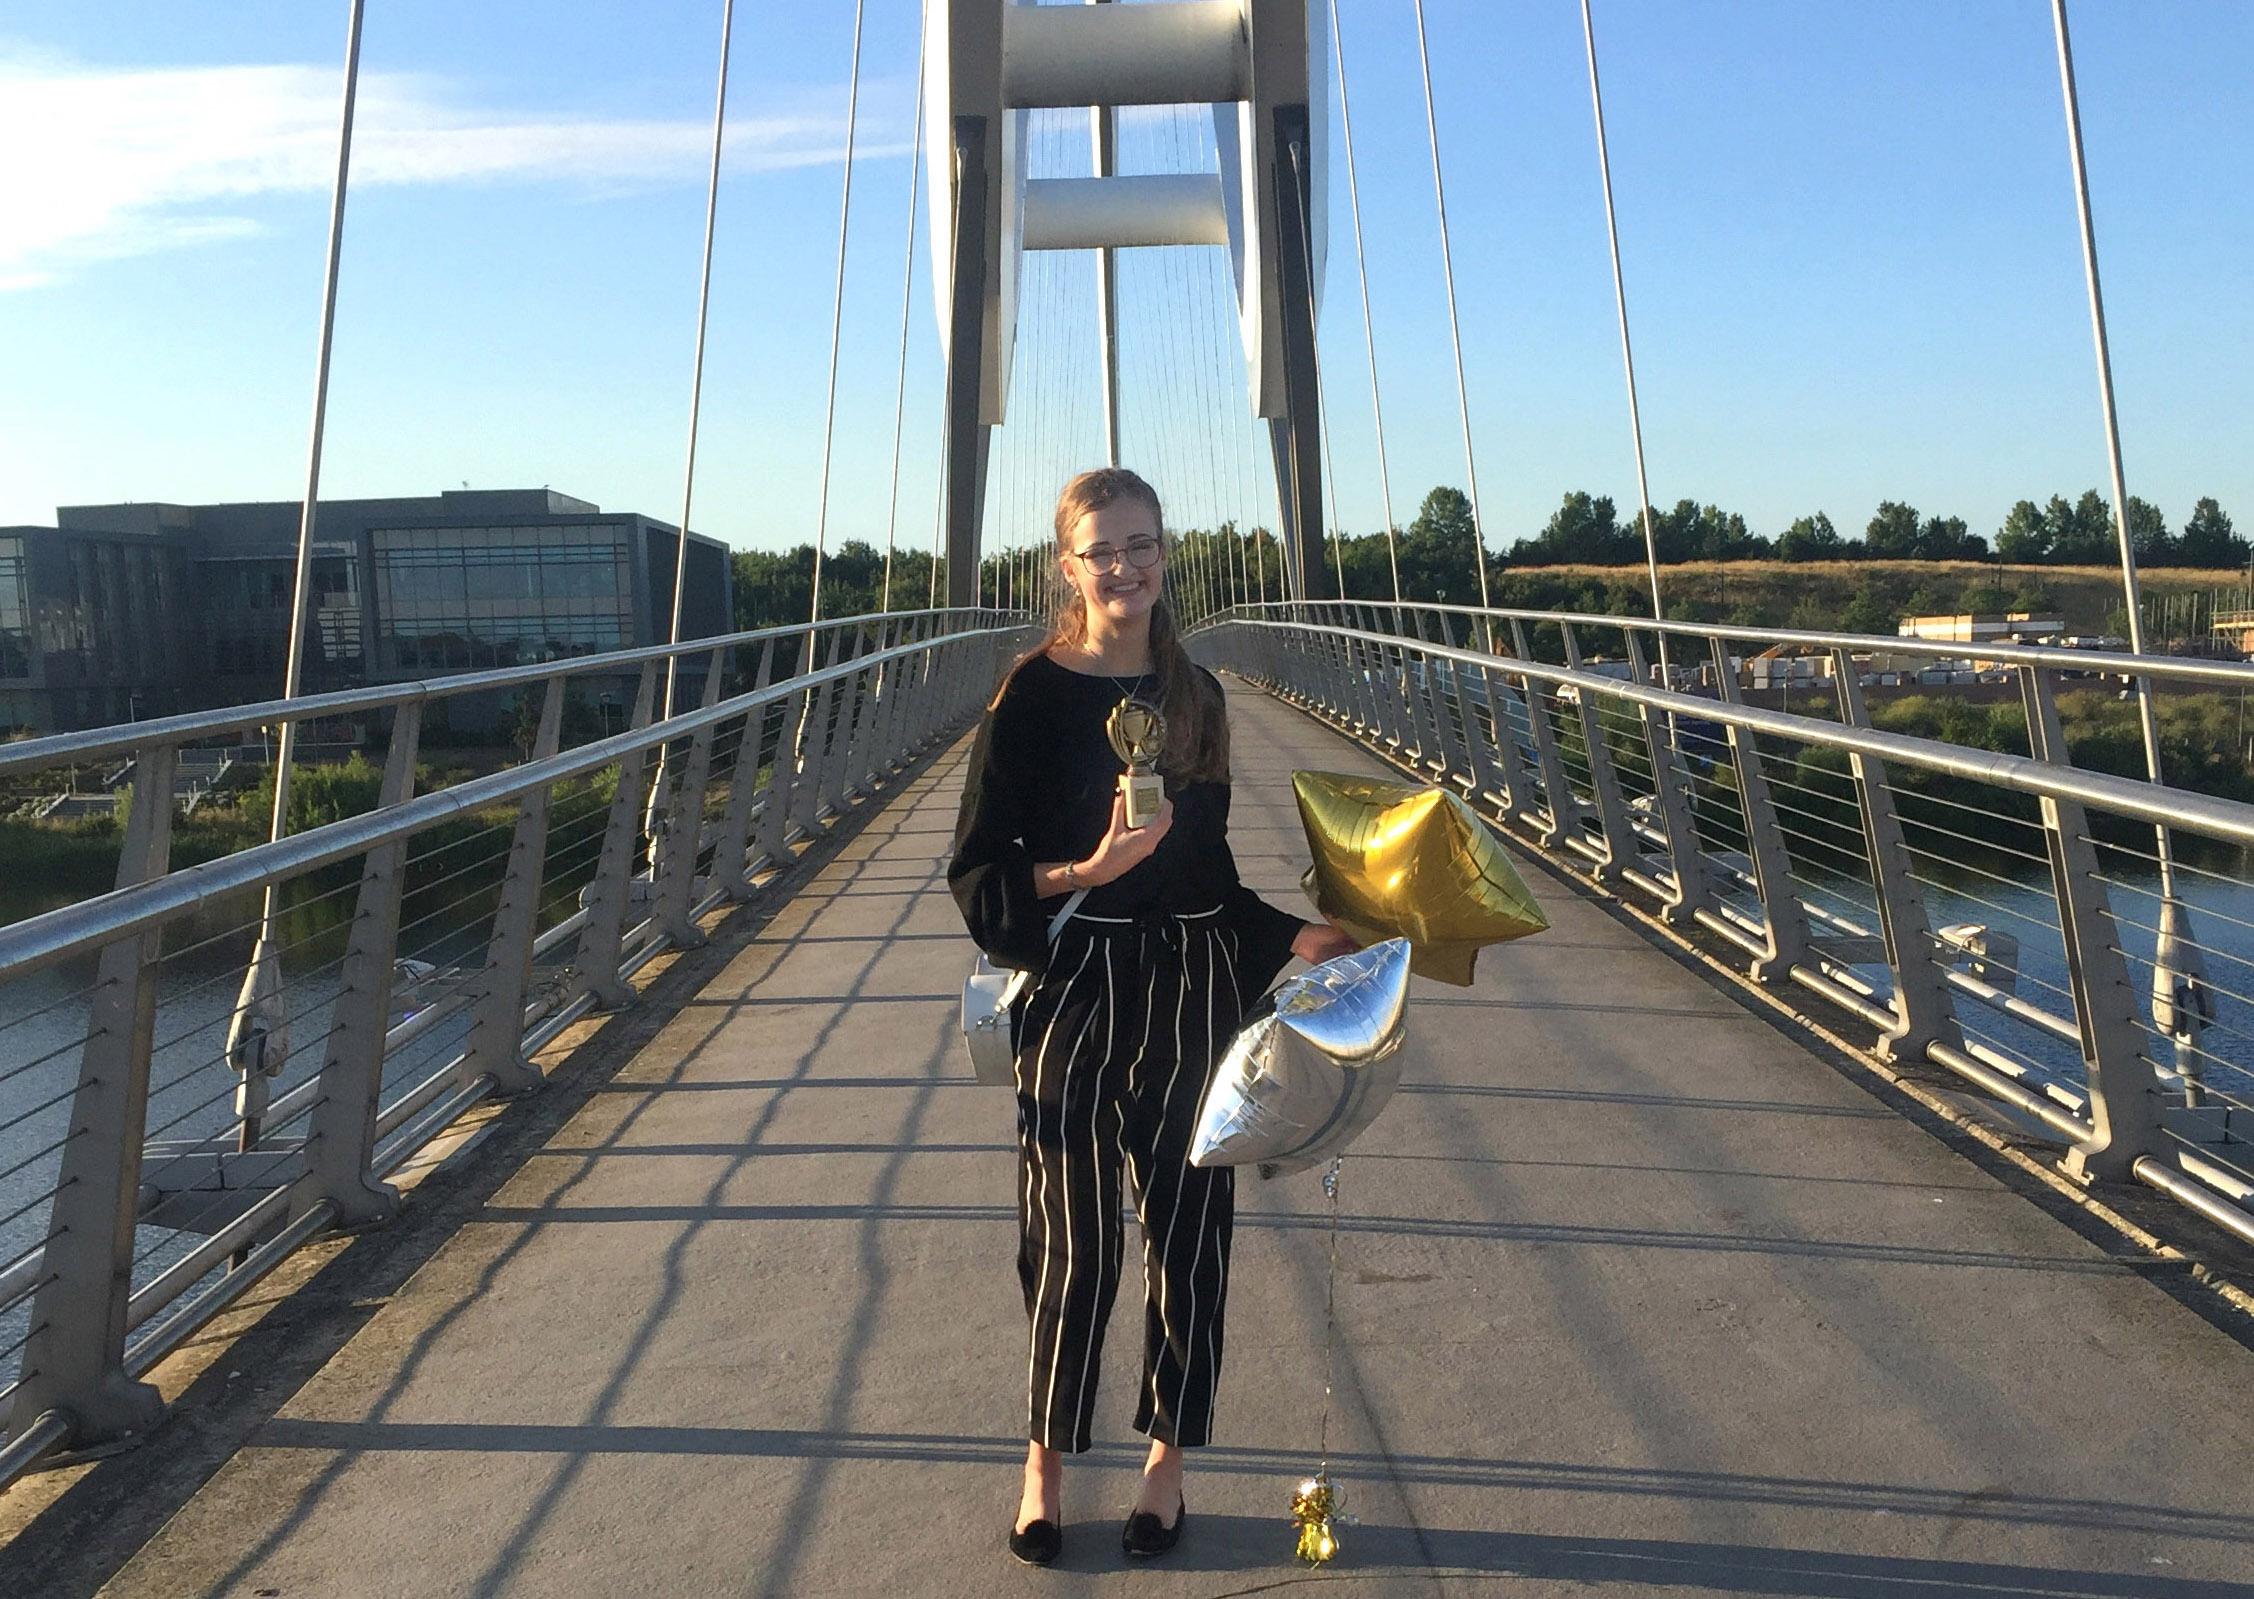 On Stockton Infinity bridge with Enterprising Stockton Award for 'Journey Travelled'